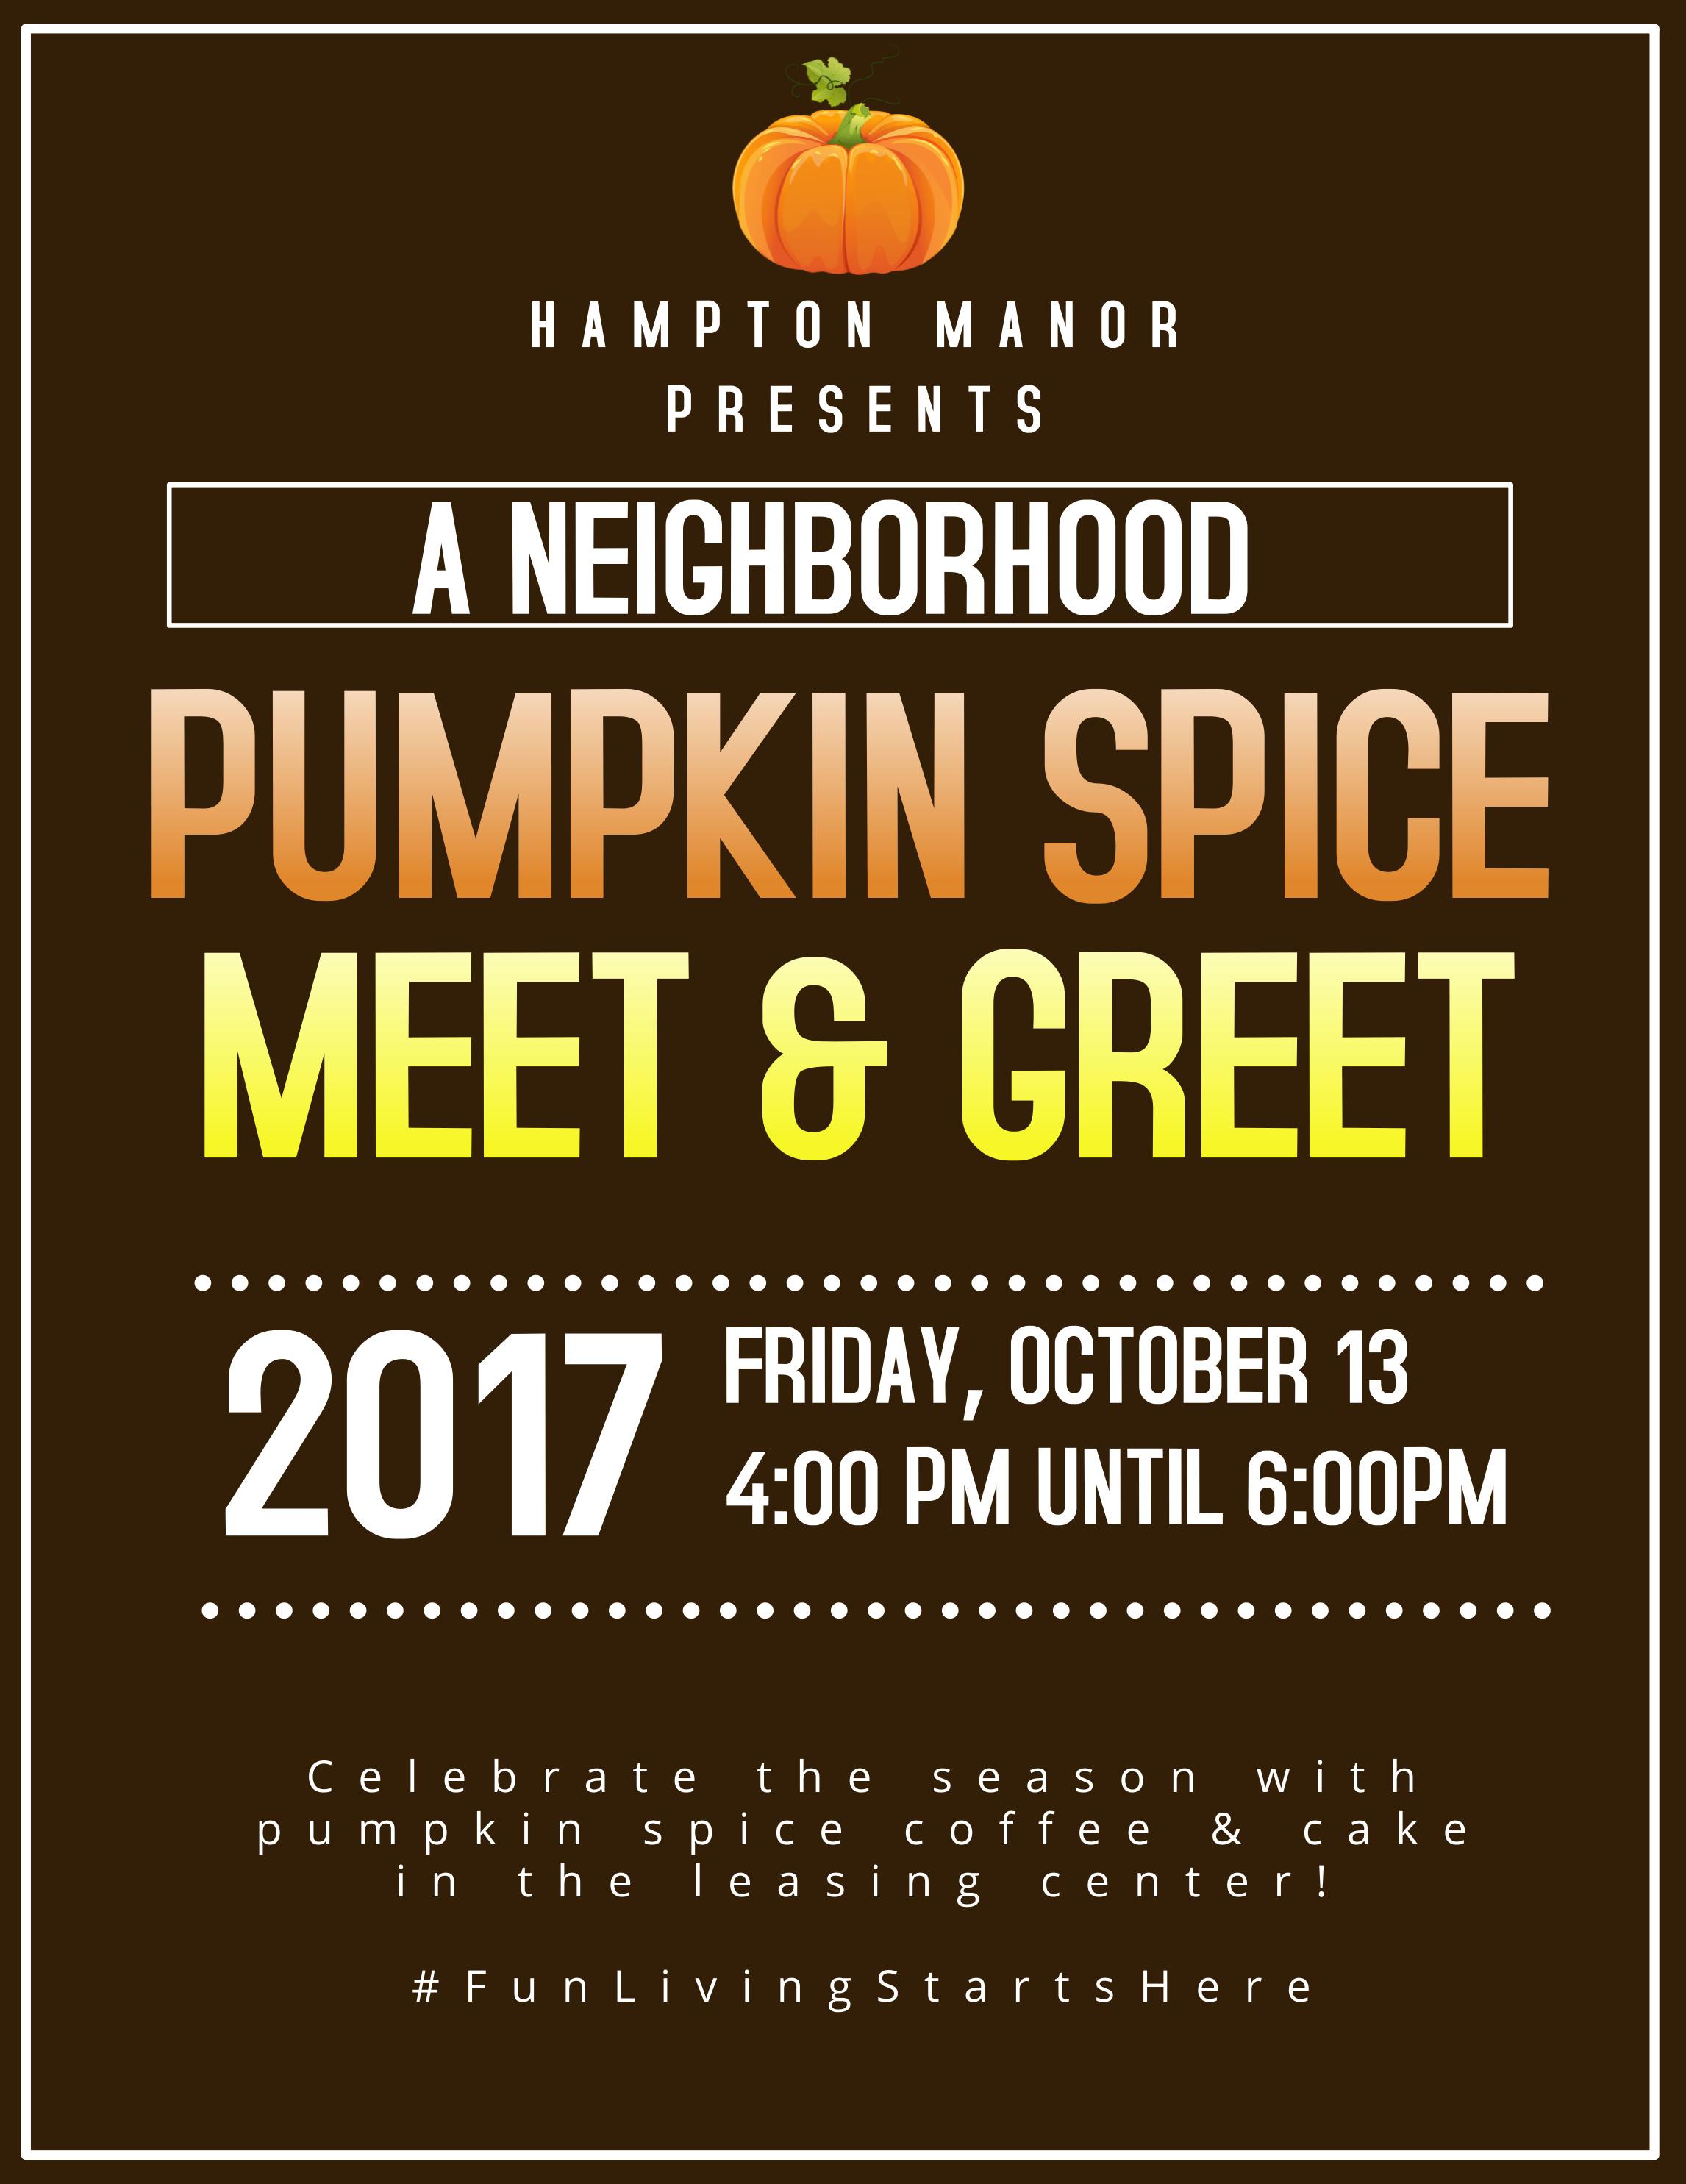 Hampton Manor Pumpkin Spice.jpg